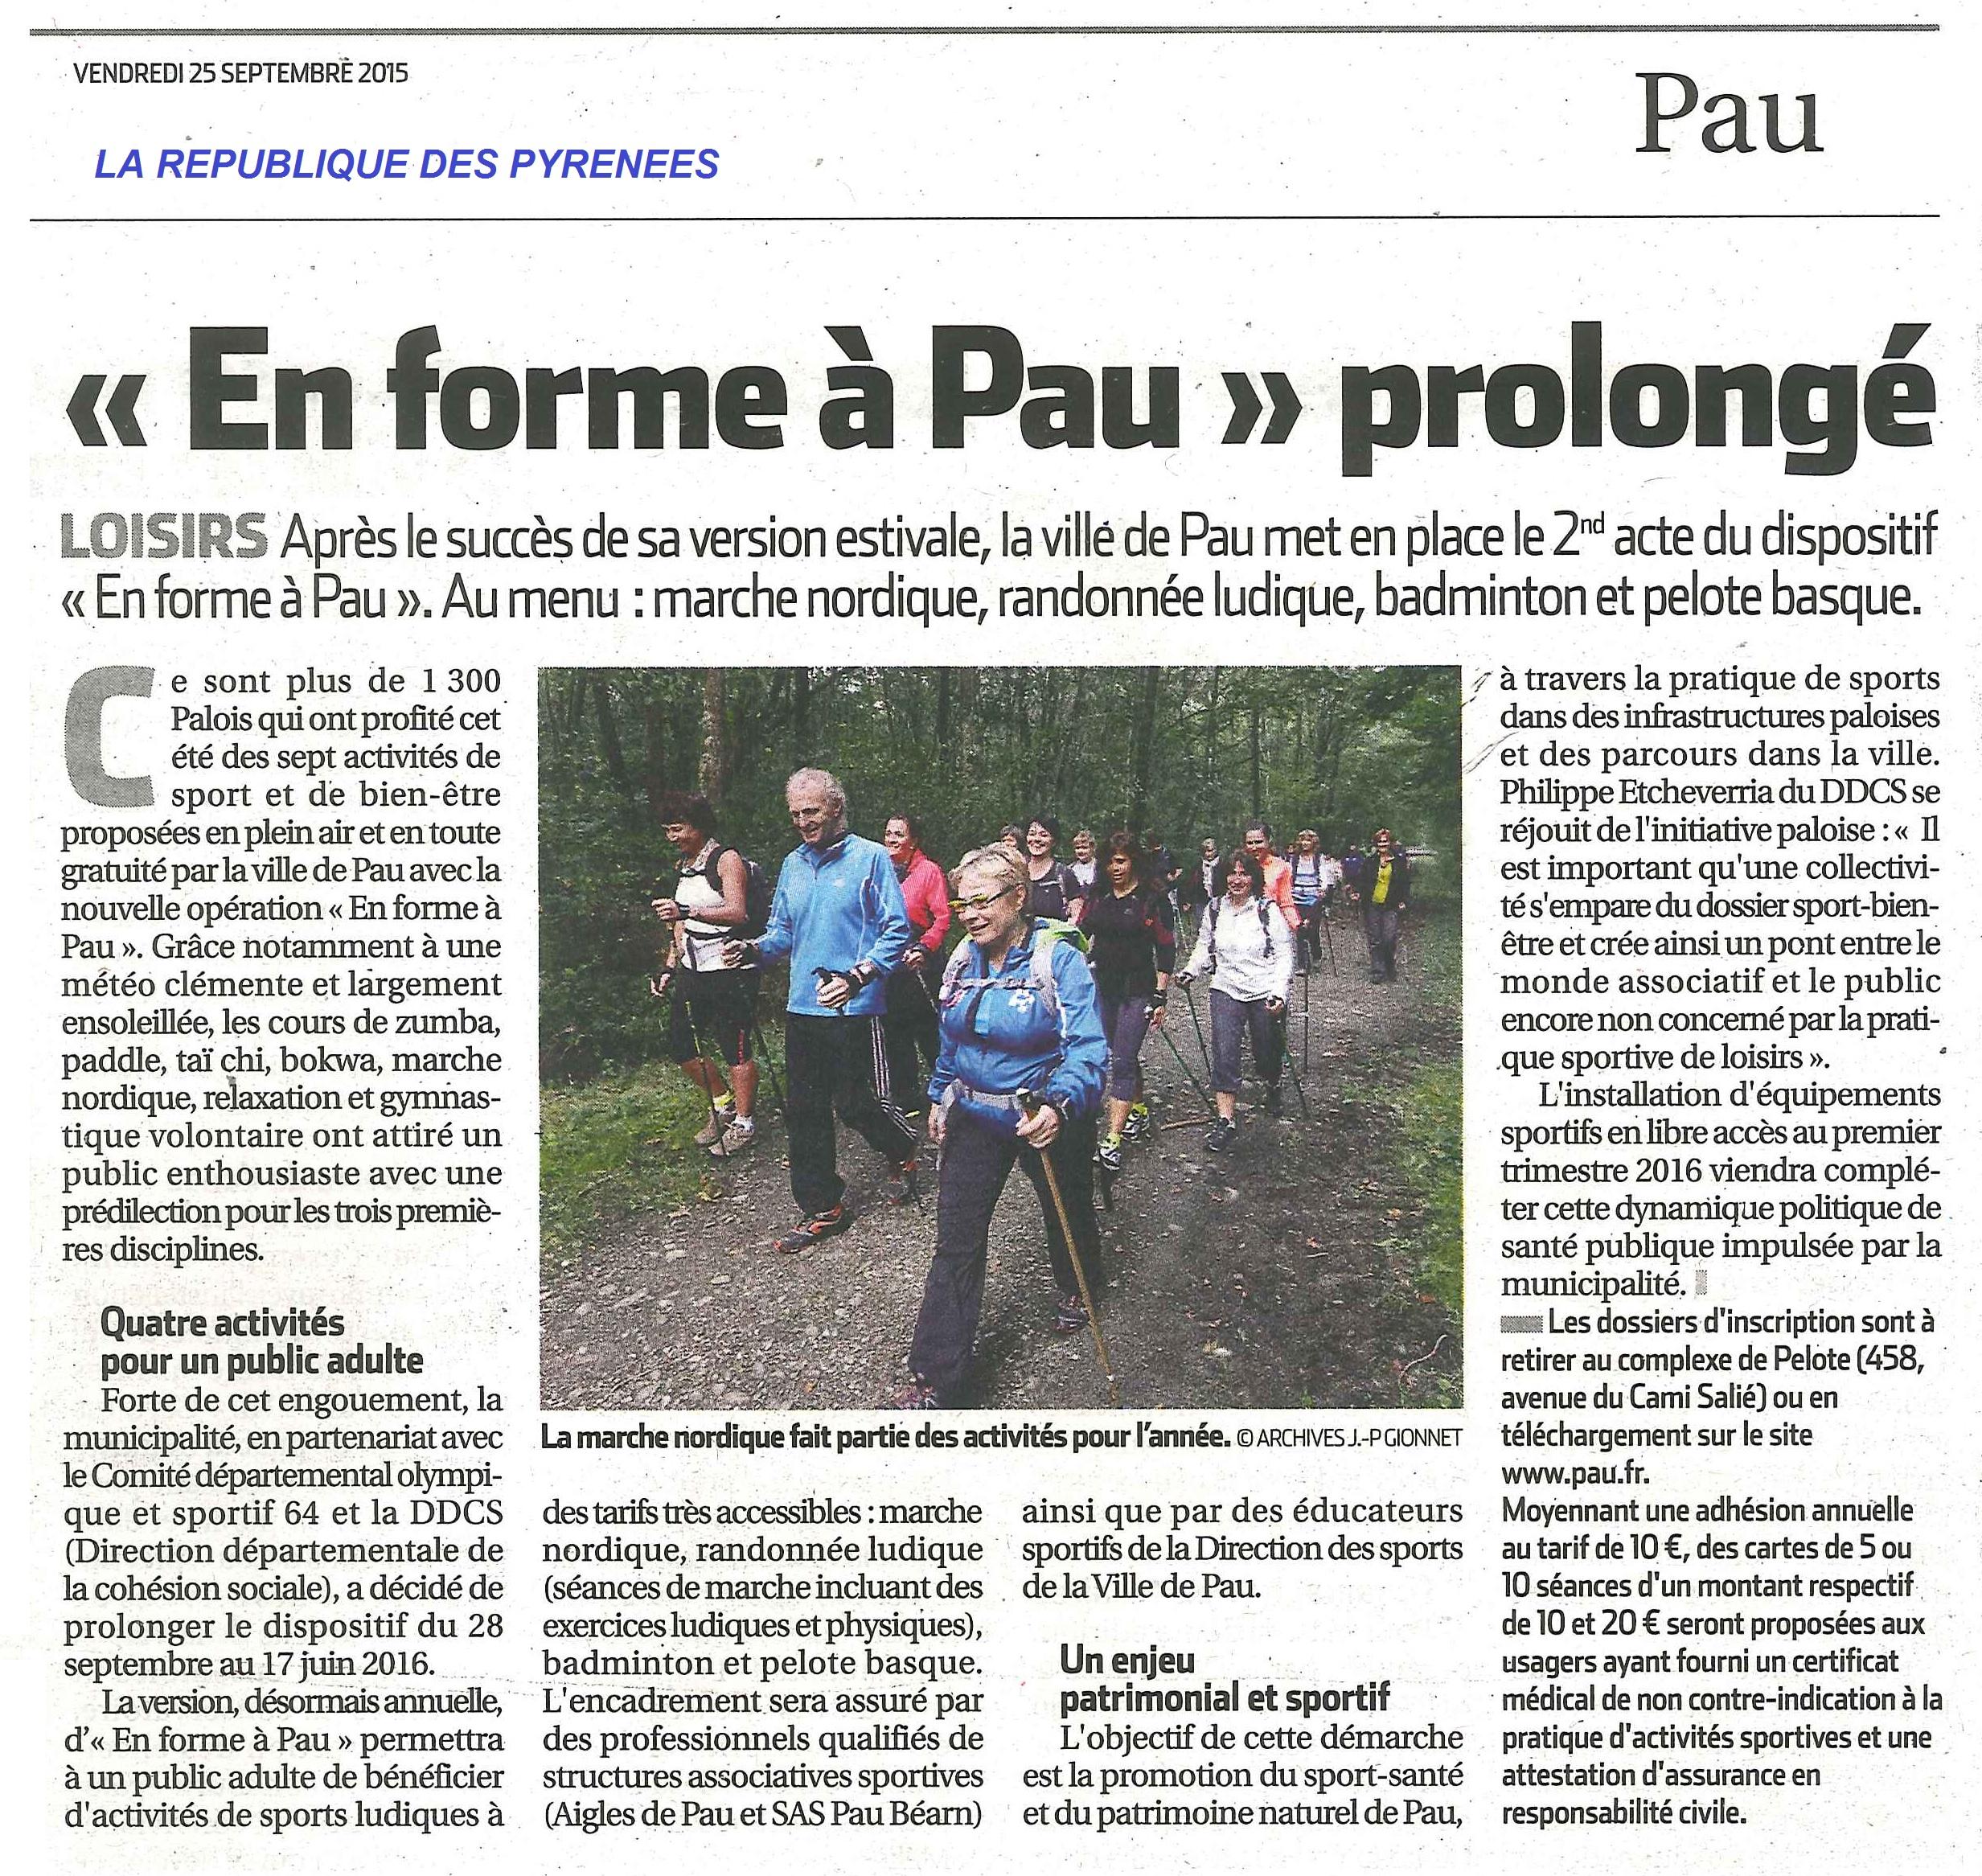 En forme a Pau